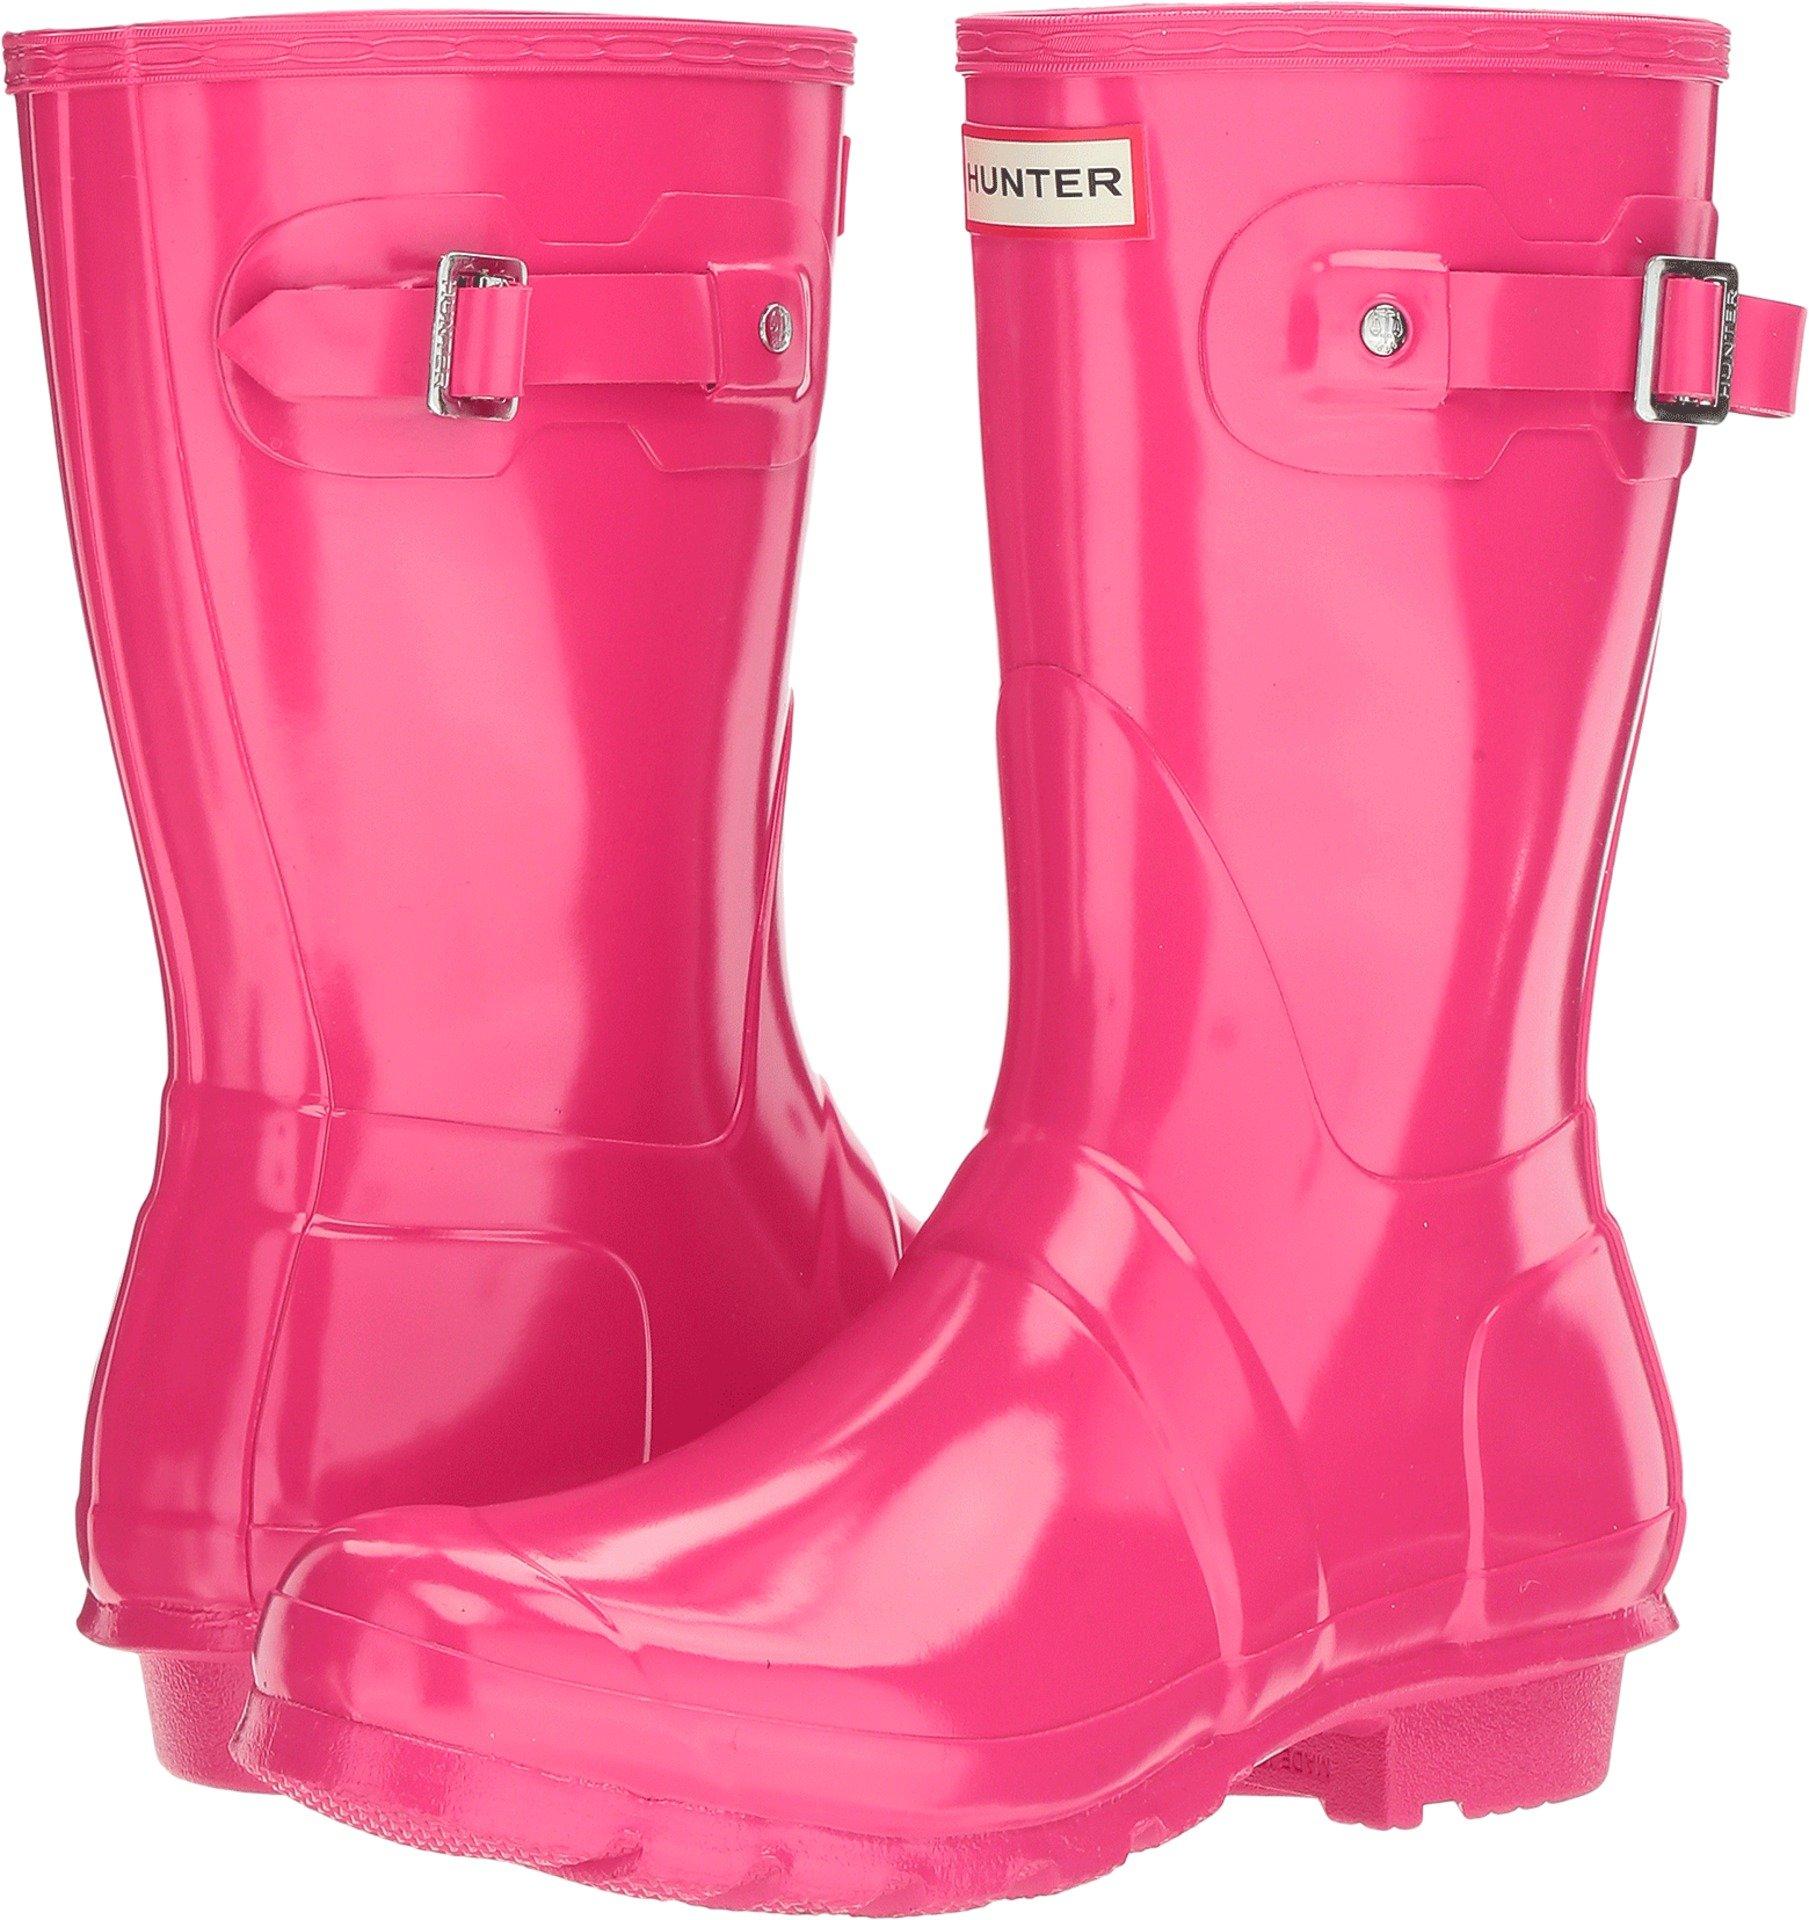 Hunter Women's Original Short Gloss Bright Pink Rain Boots - 8 B(M) US